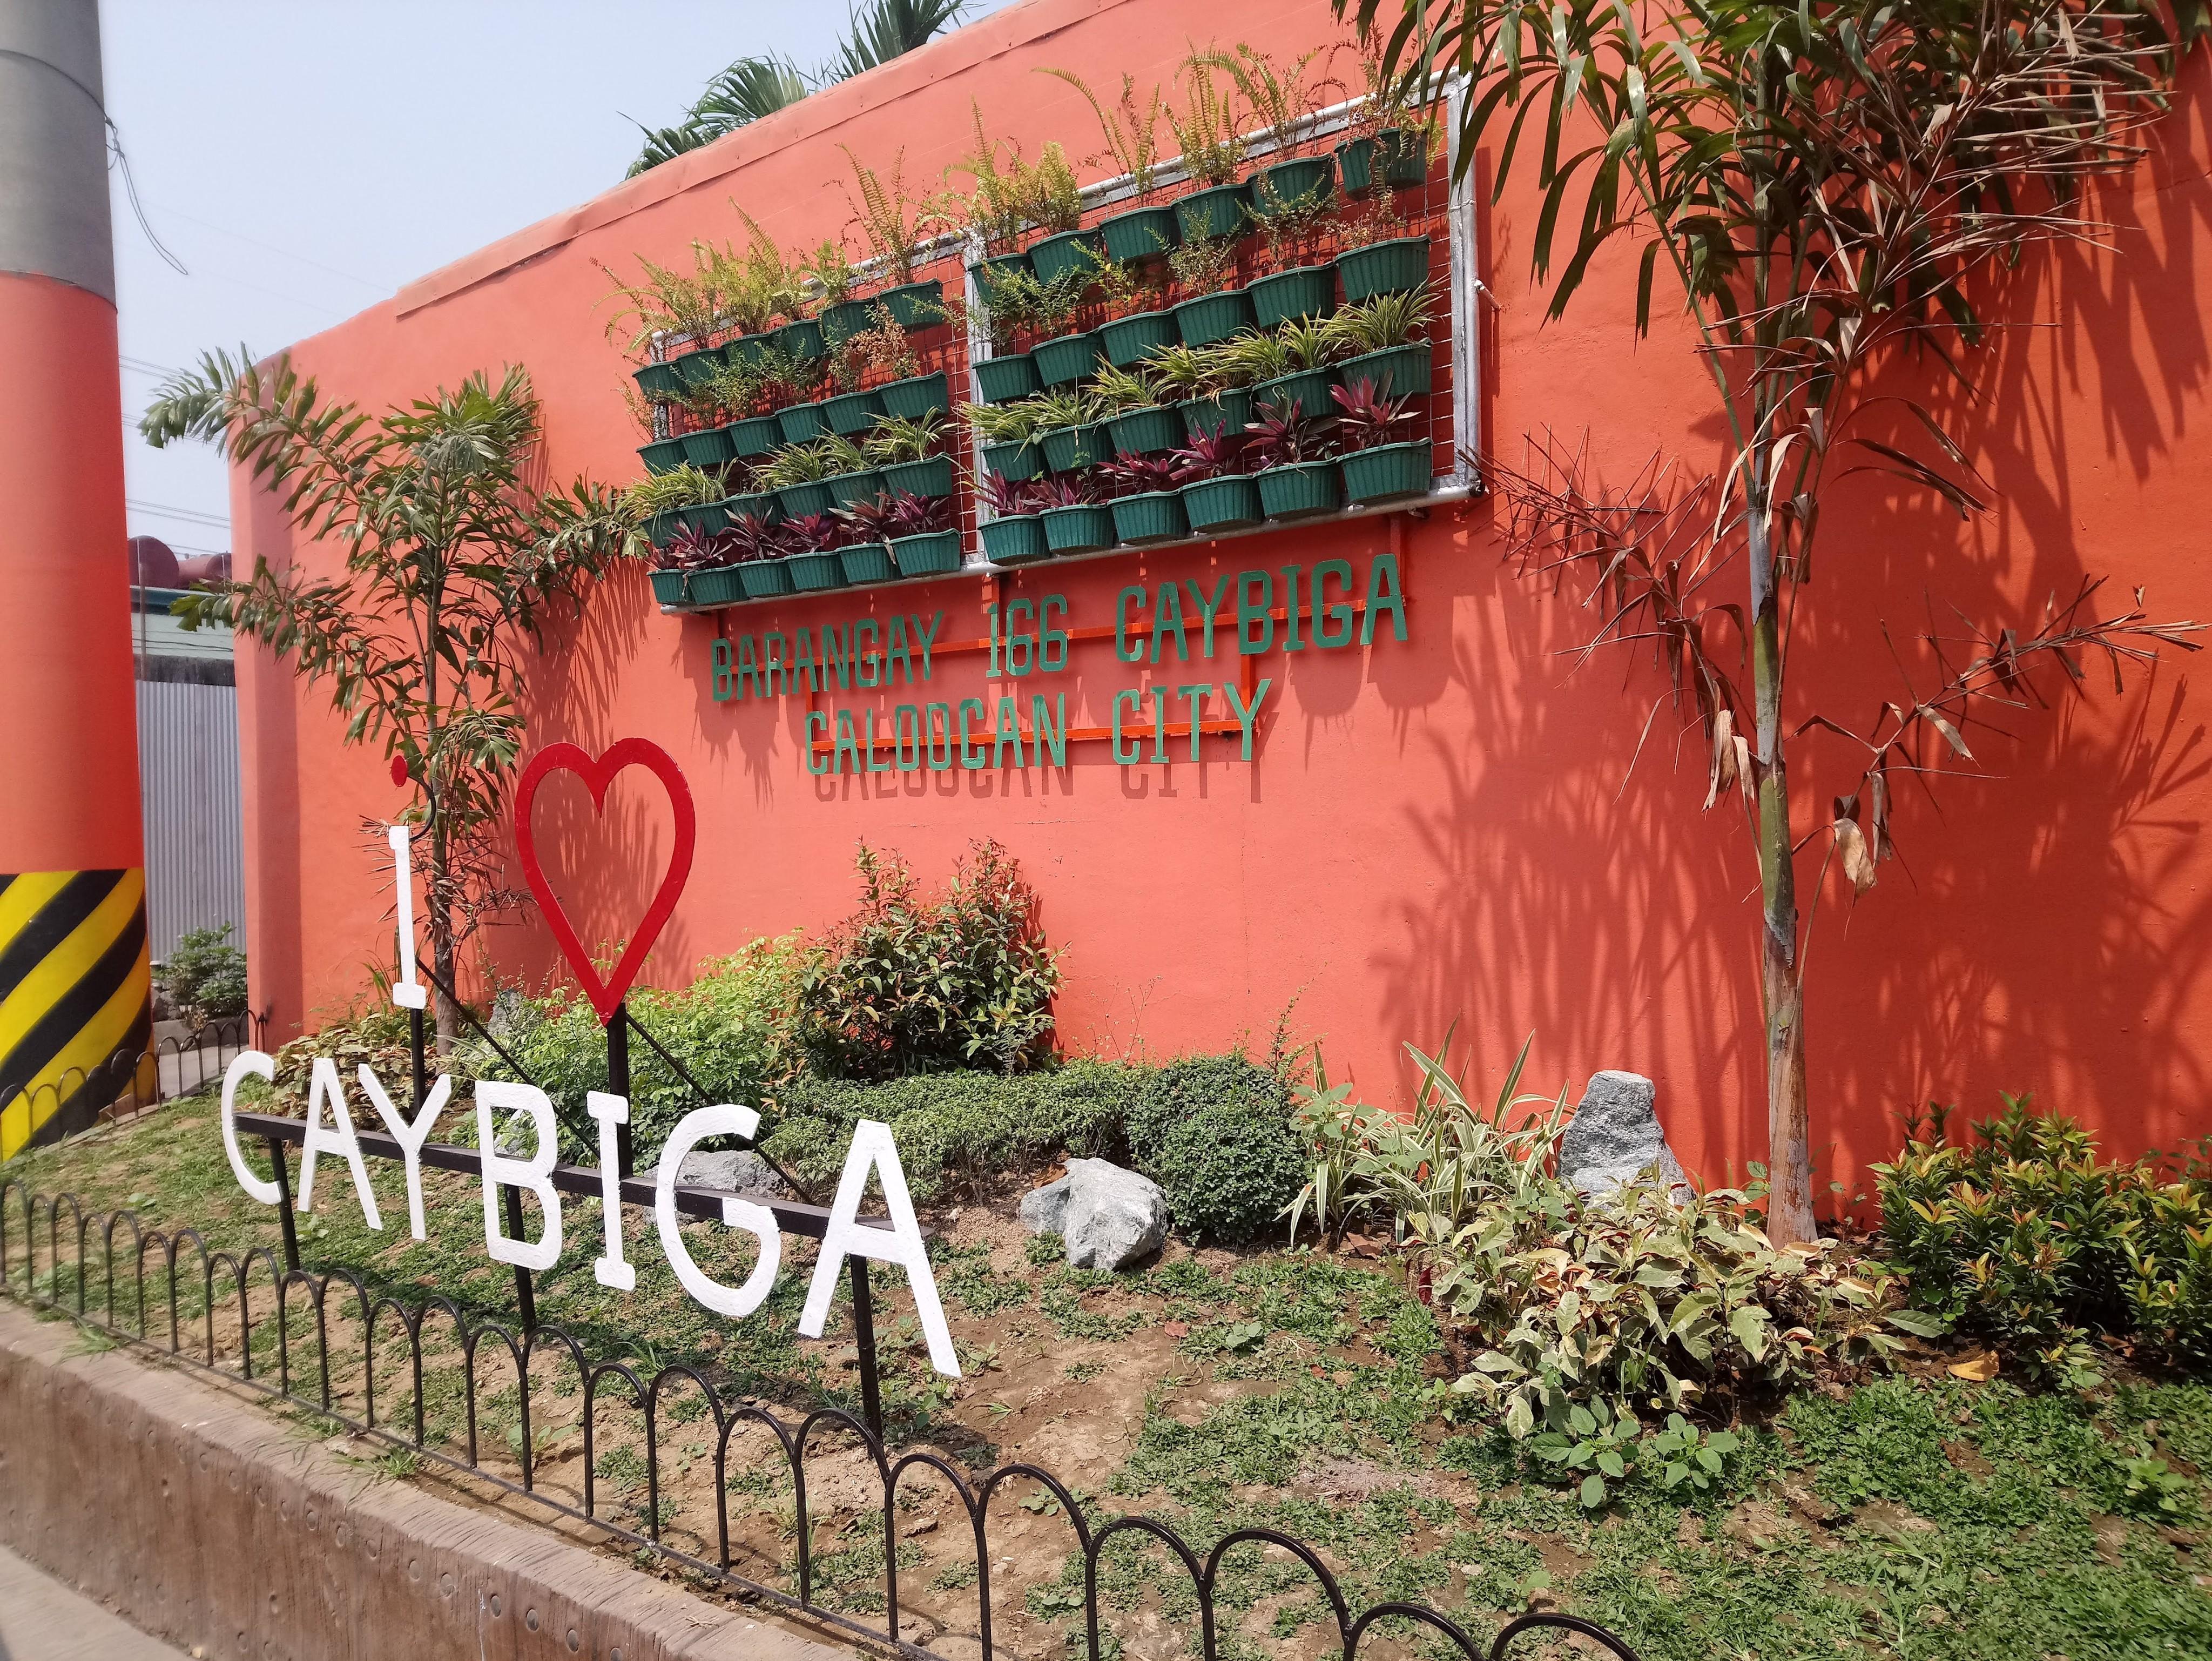 caybiga